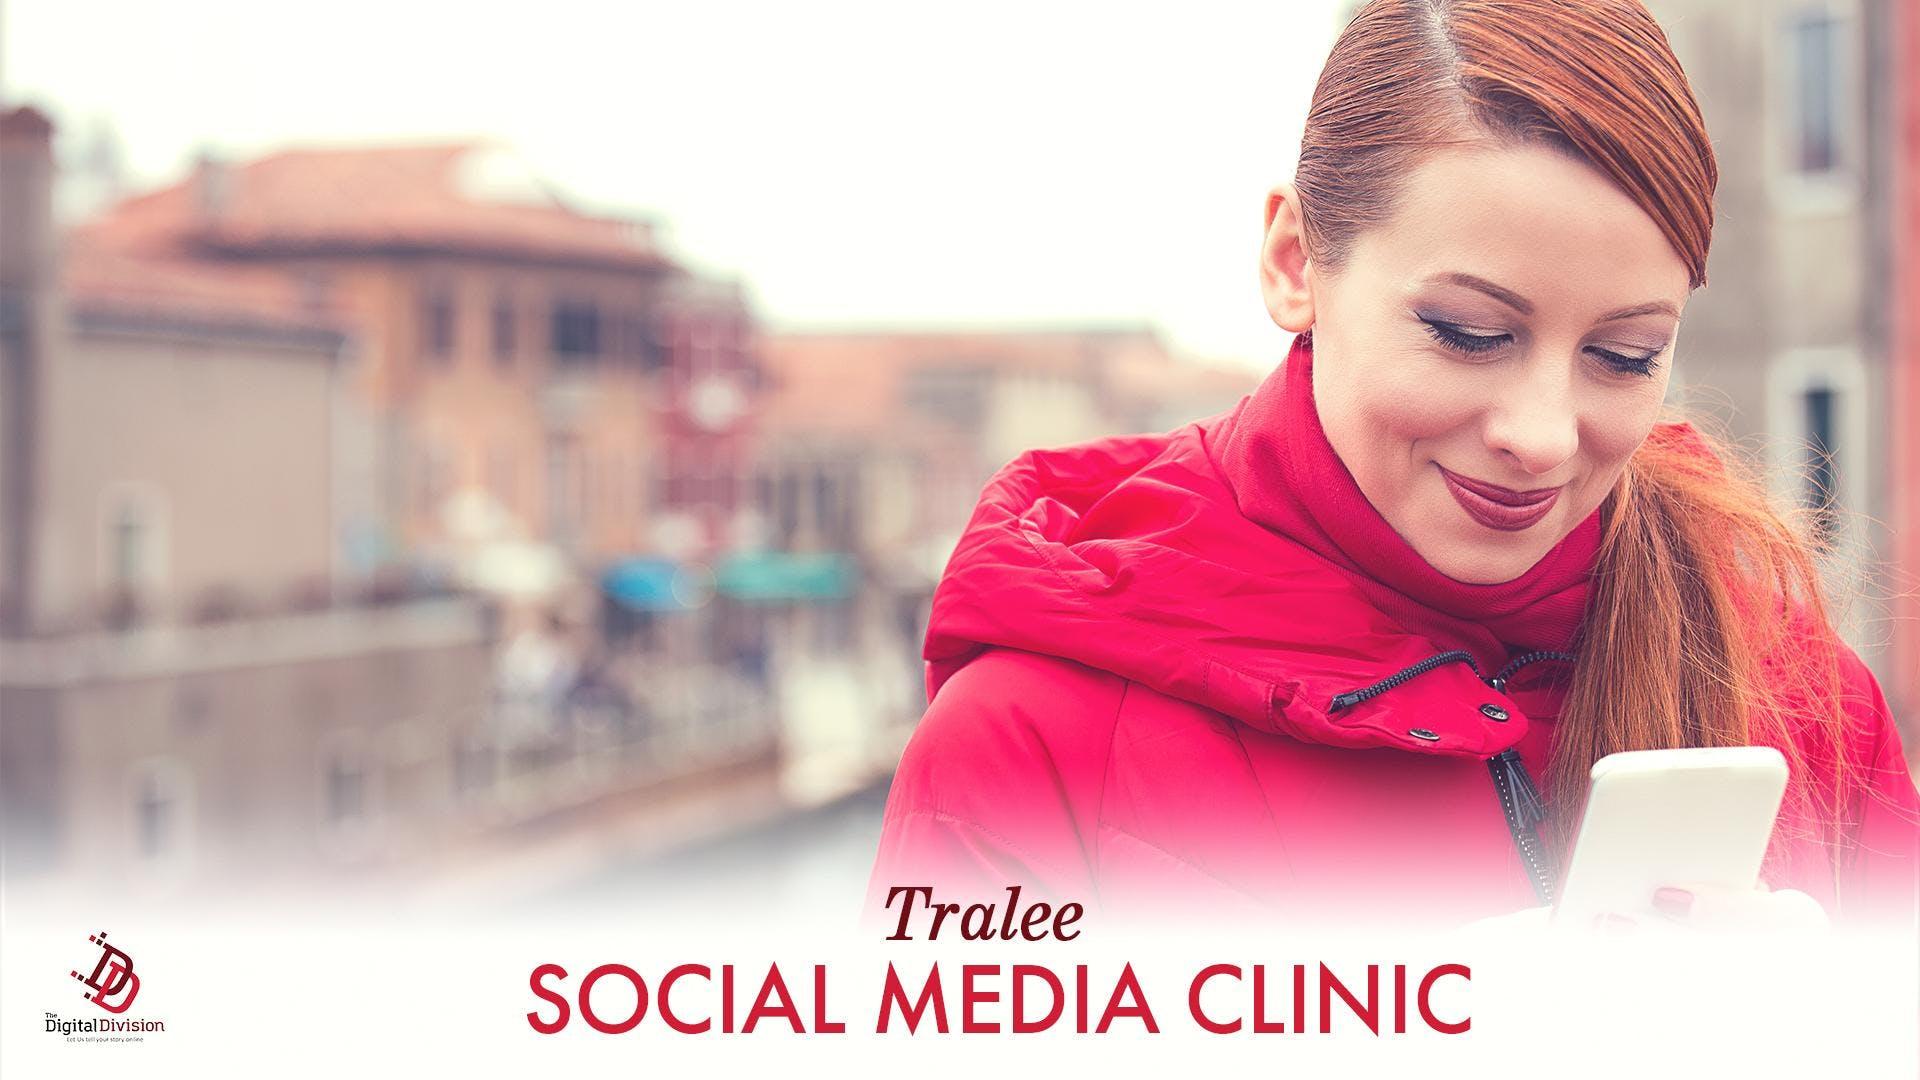 Tralee Social Media Clinic - 1 to 1 Consultation